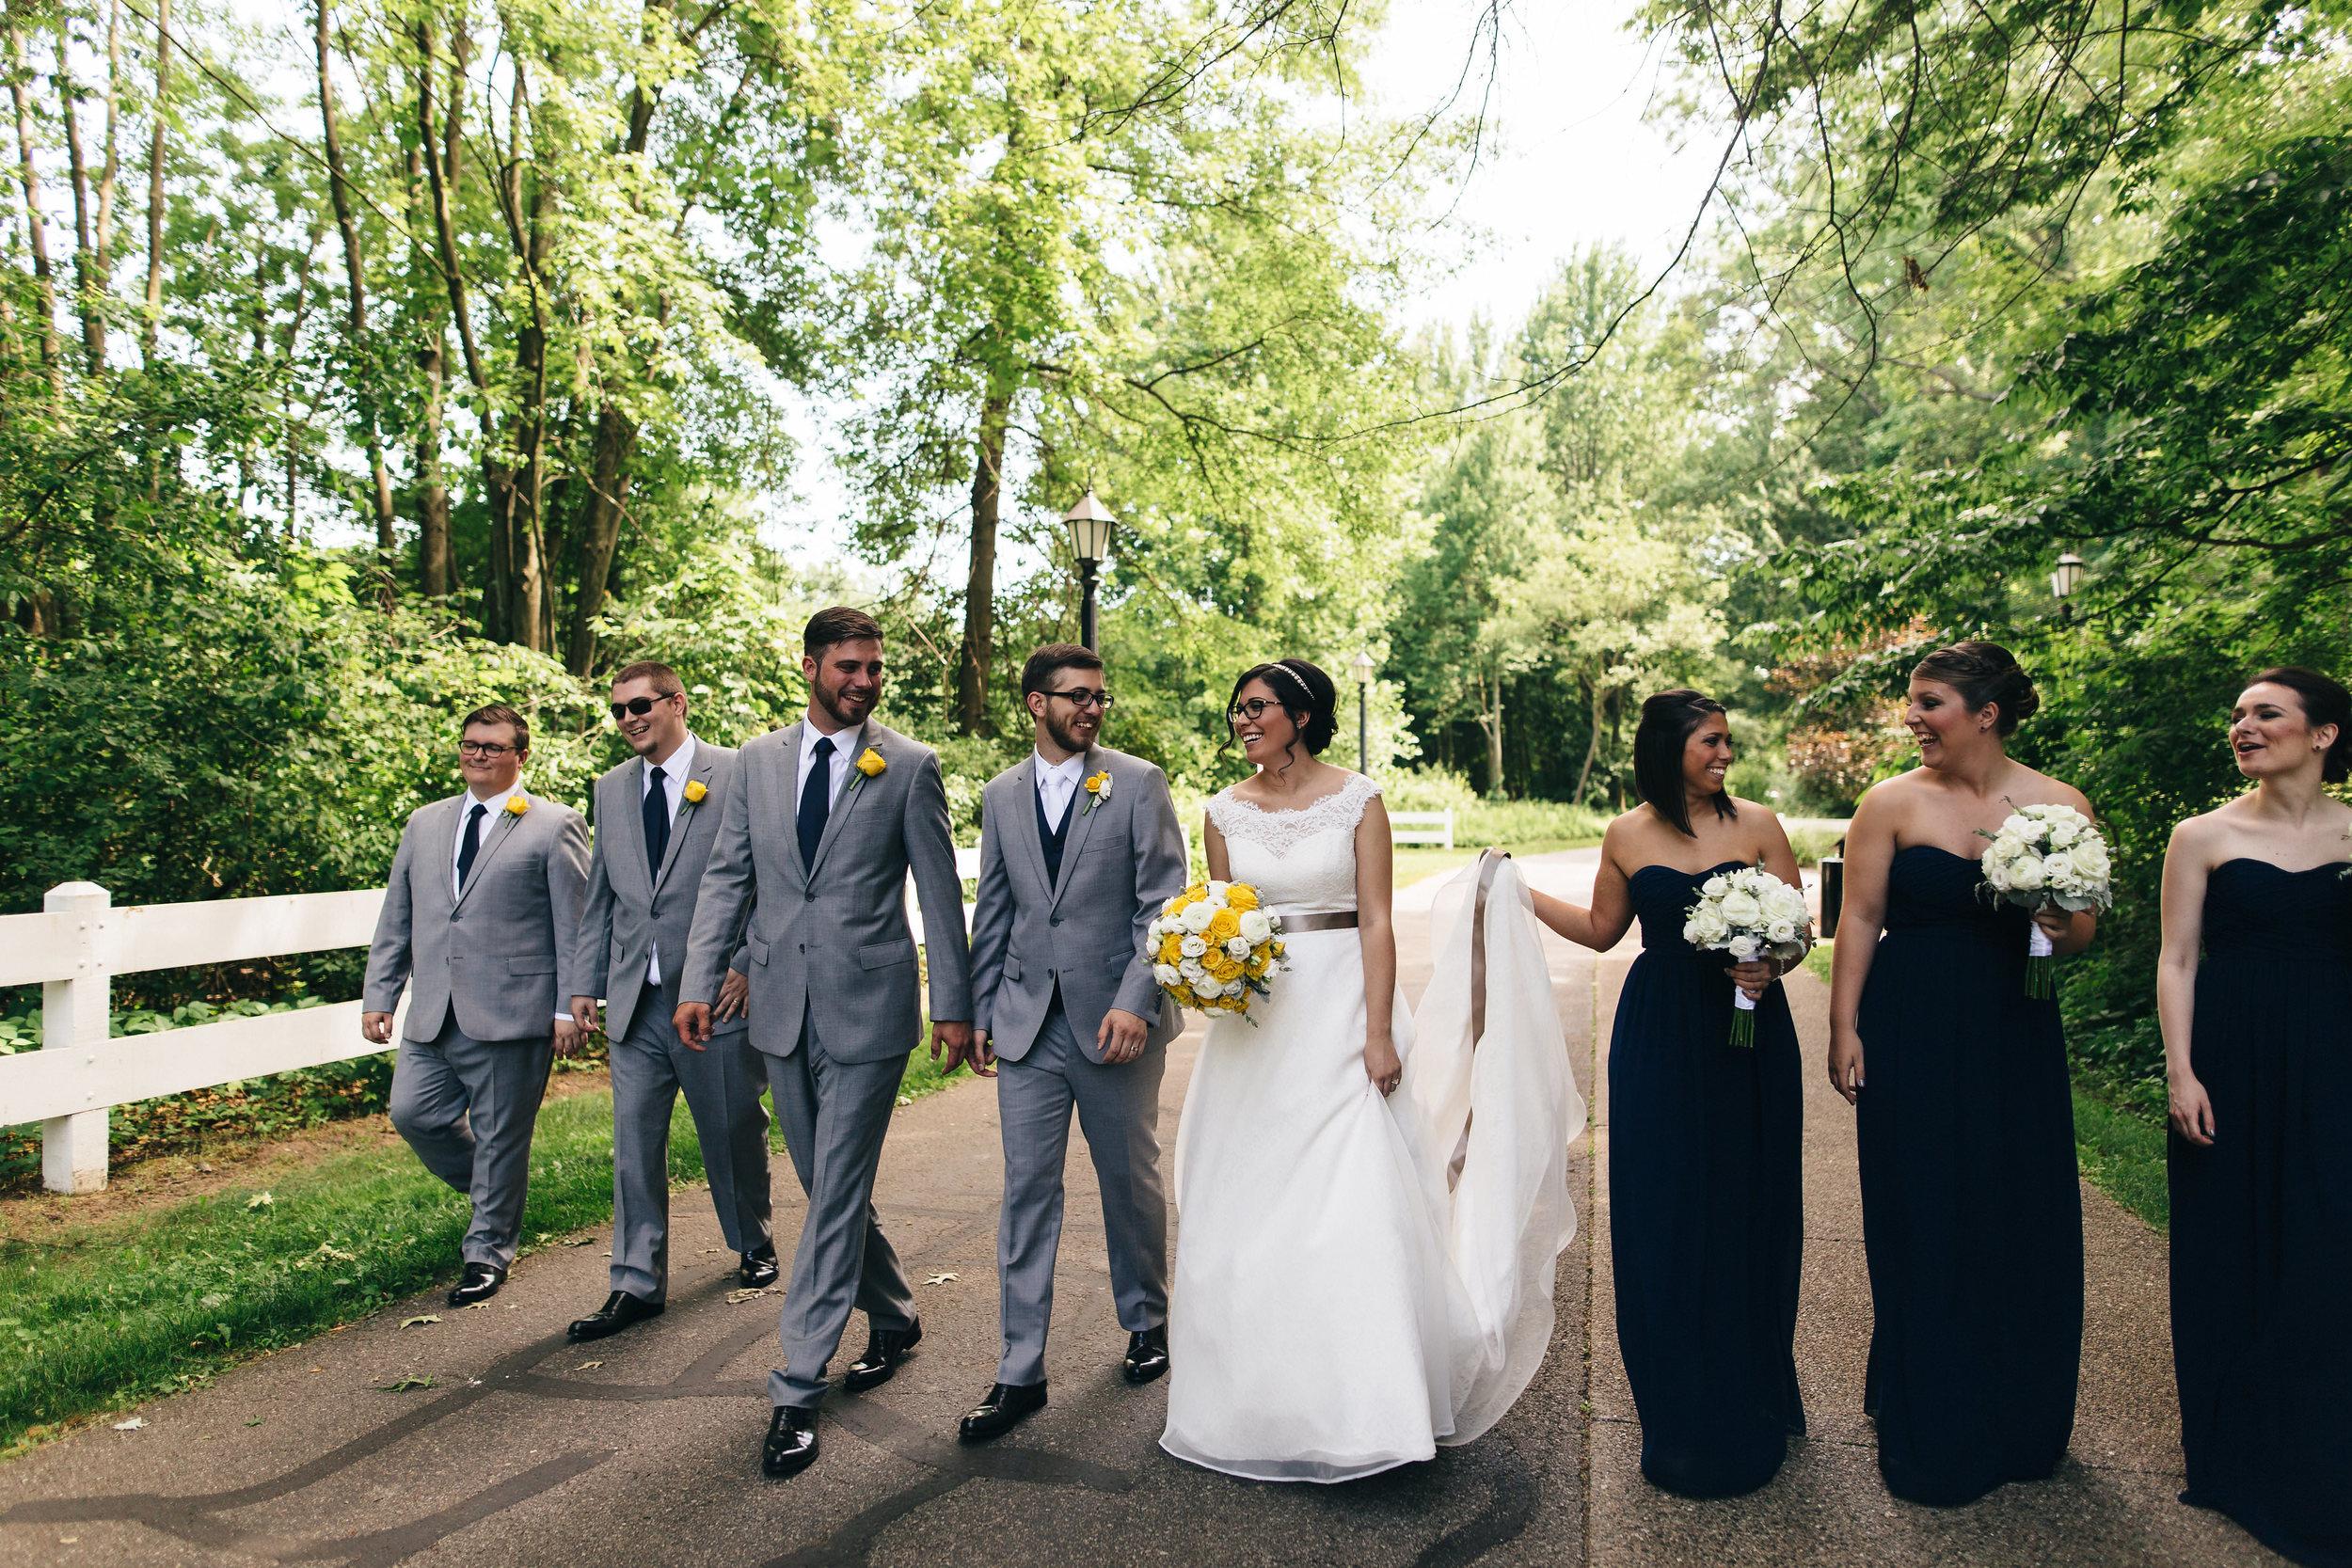 Wedding party photography at Wildwood Metropark in Toledo.